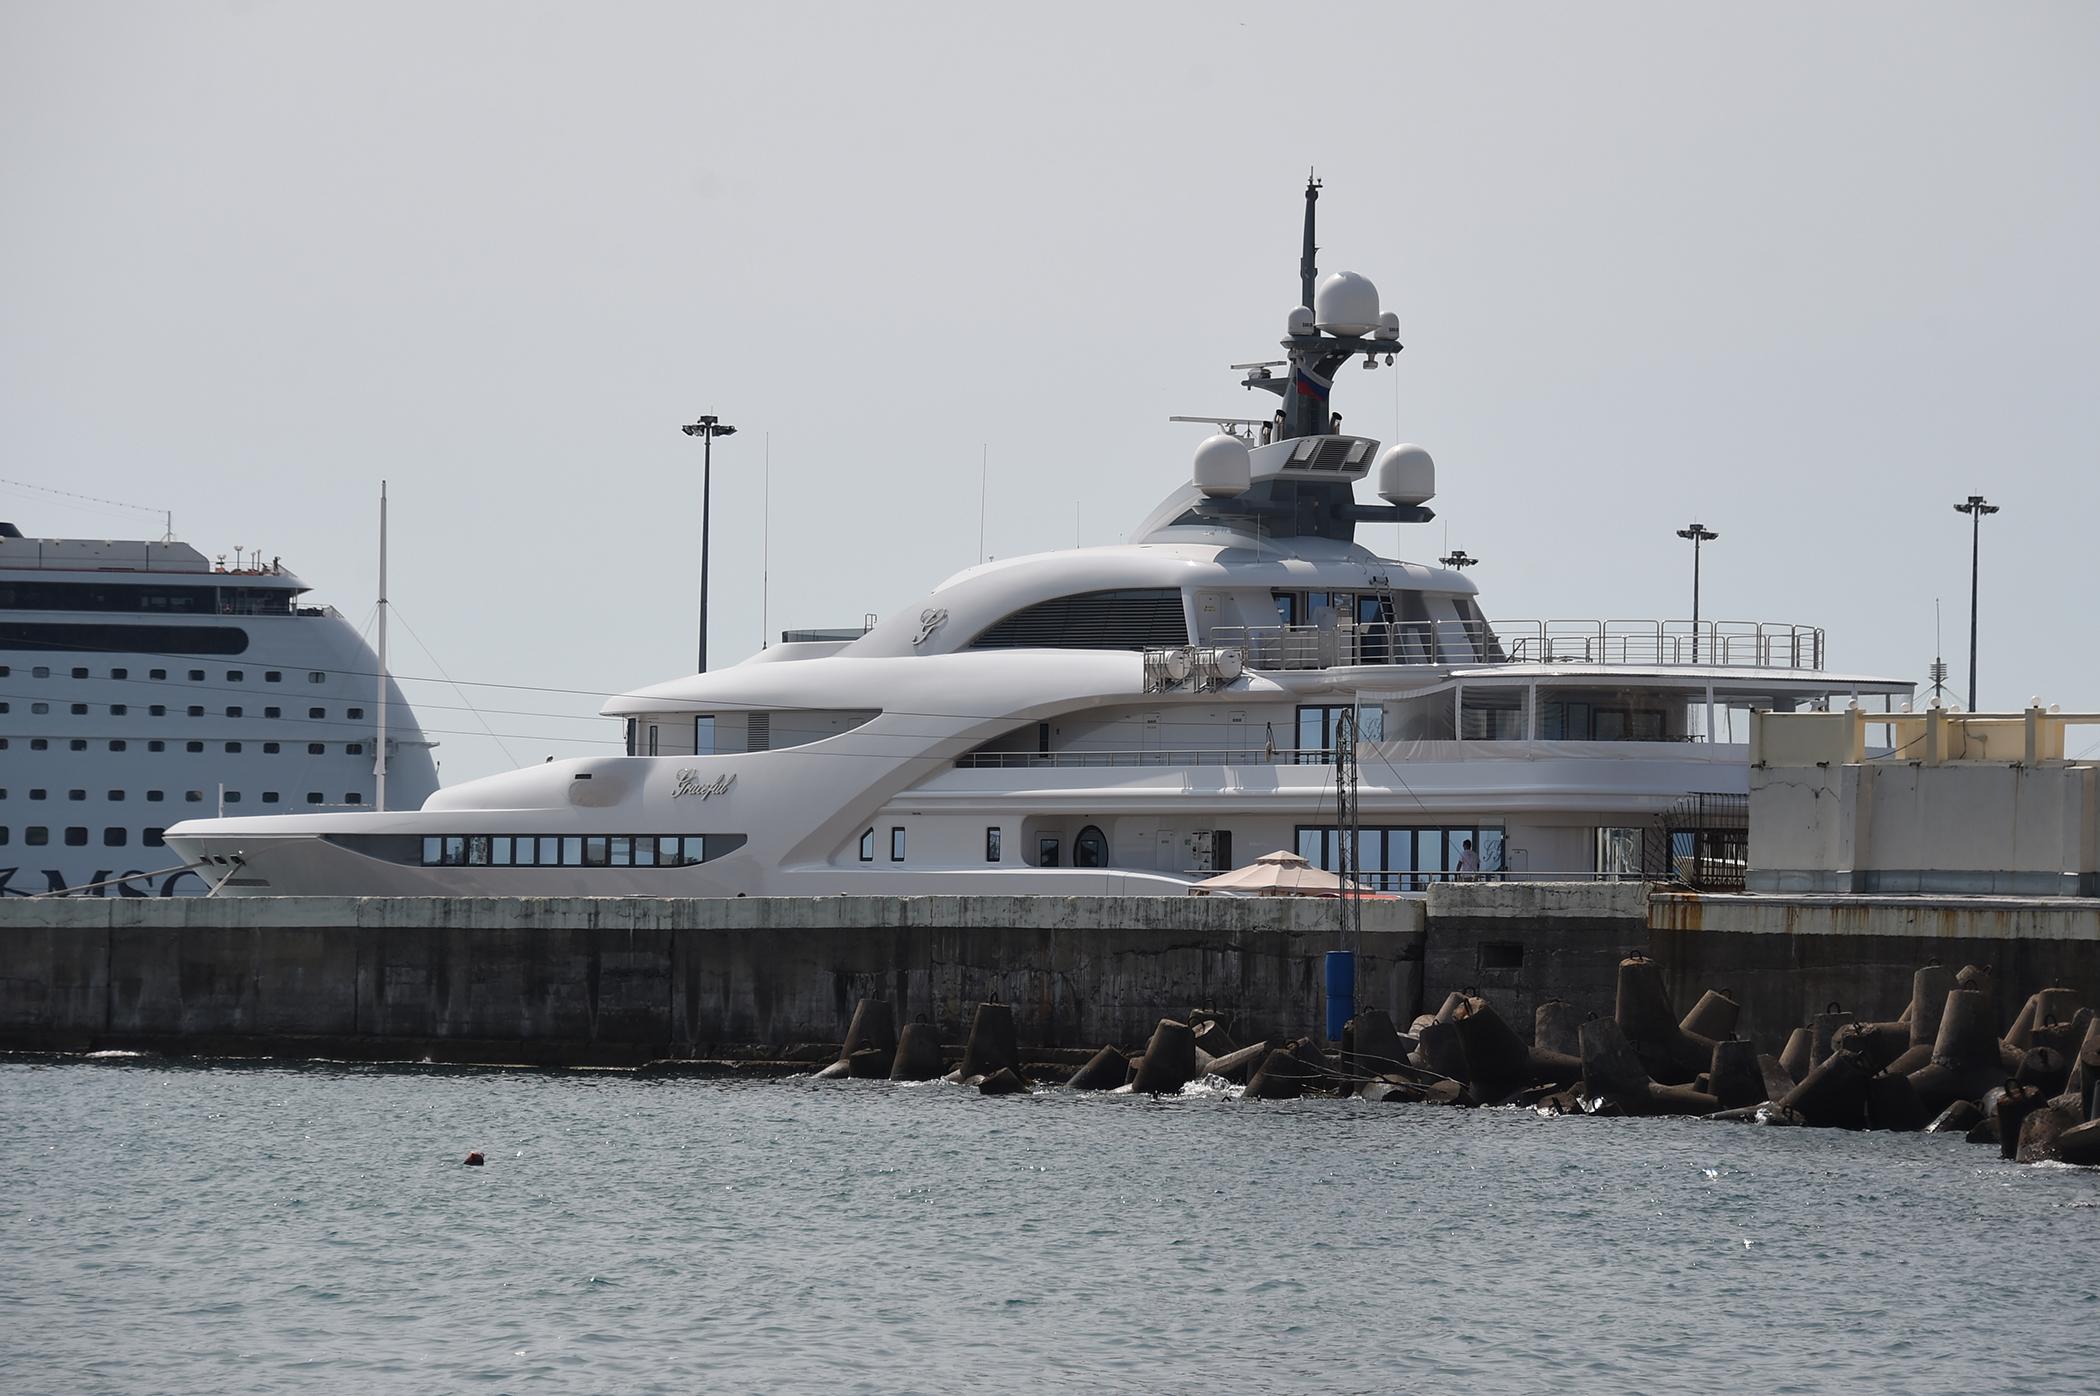 Vladimir Putin's Yacht